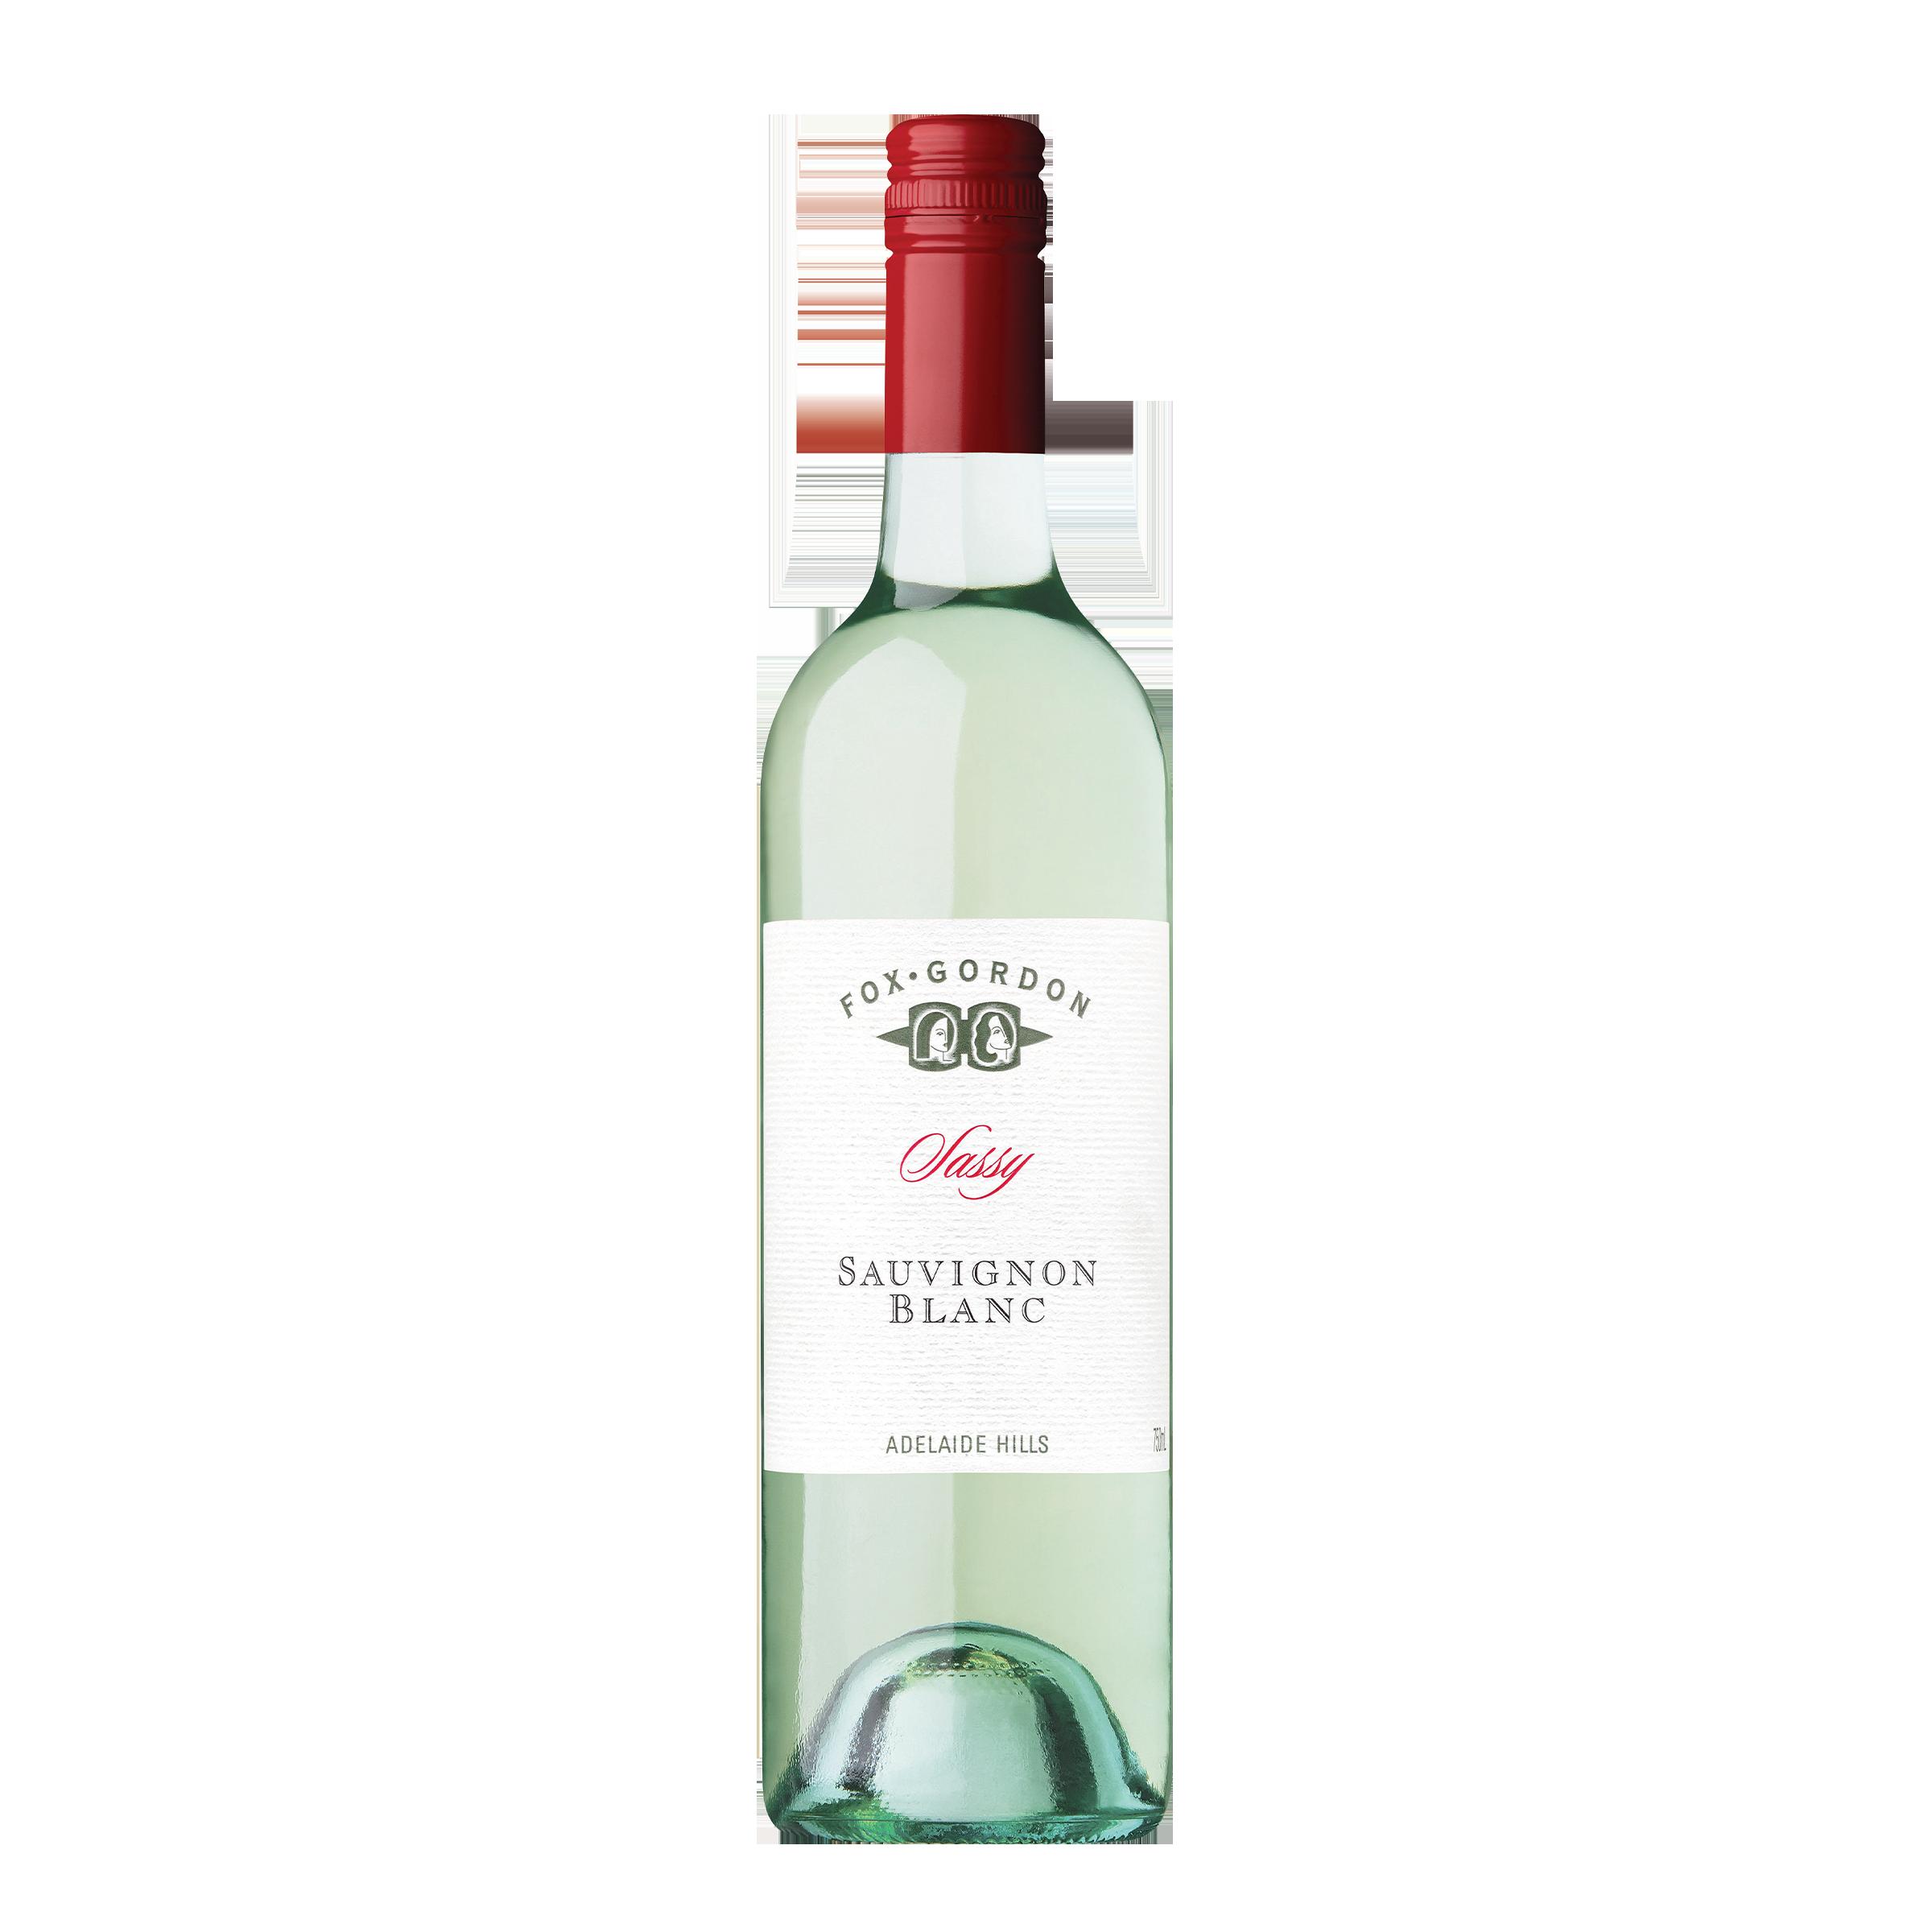 Fox Gordon Sassy Sauvignon Blanc